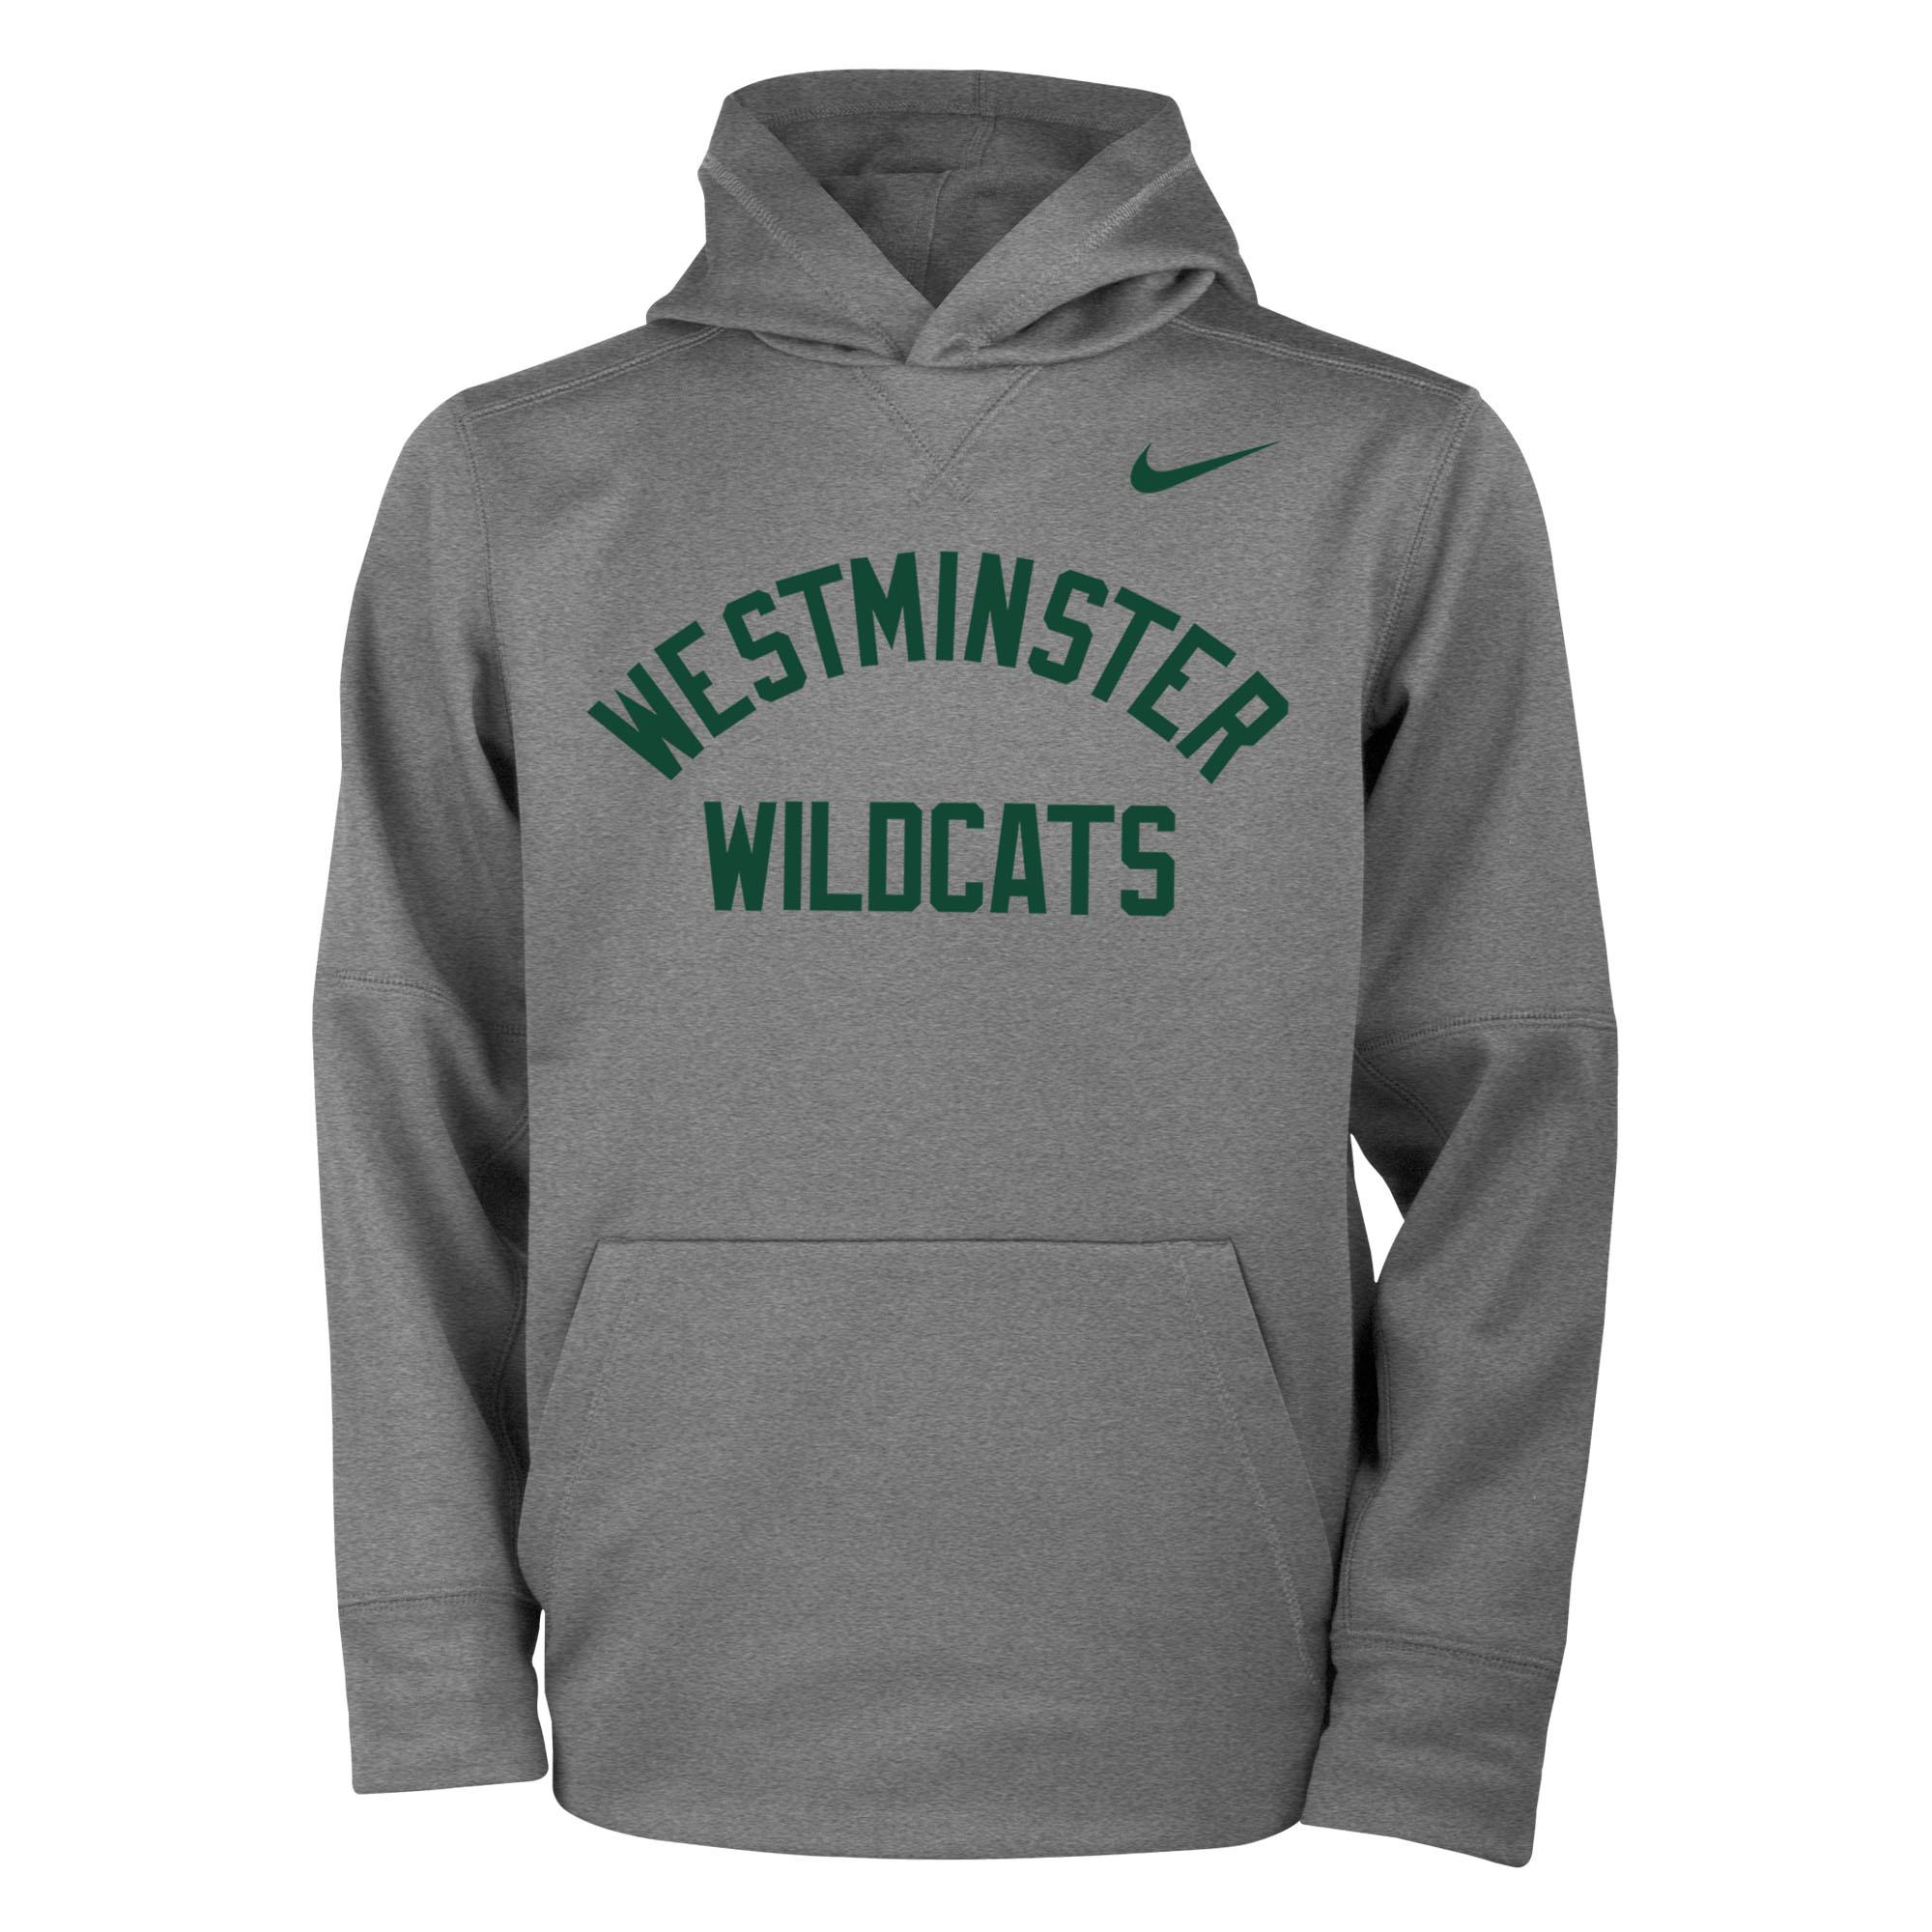 Sweatshirt: Therma PO Hoody Gray w/green lettering